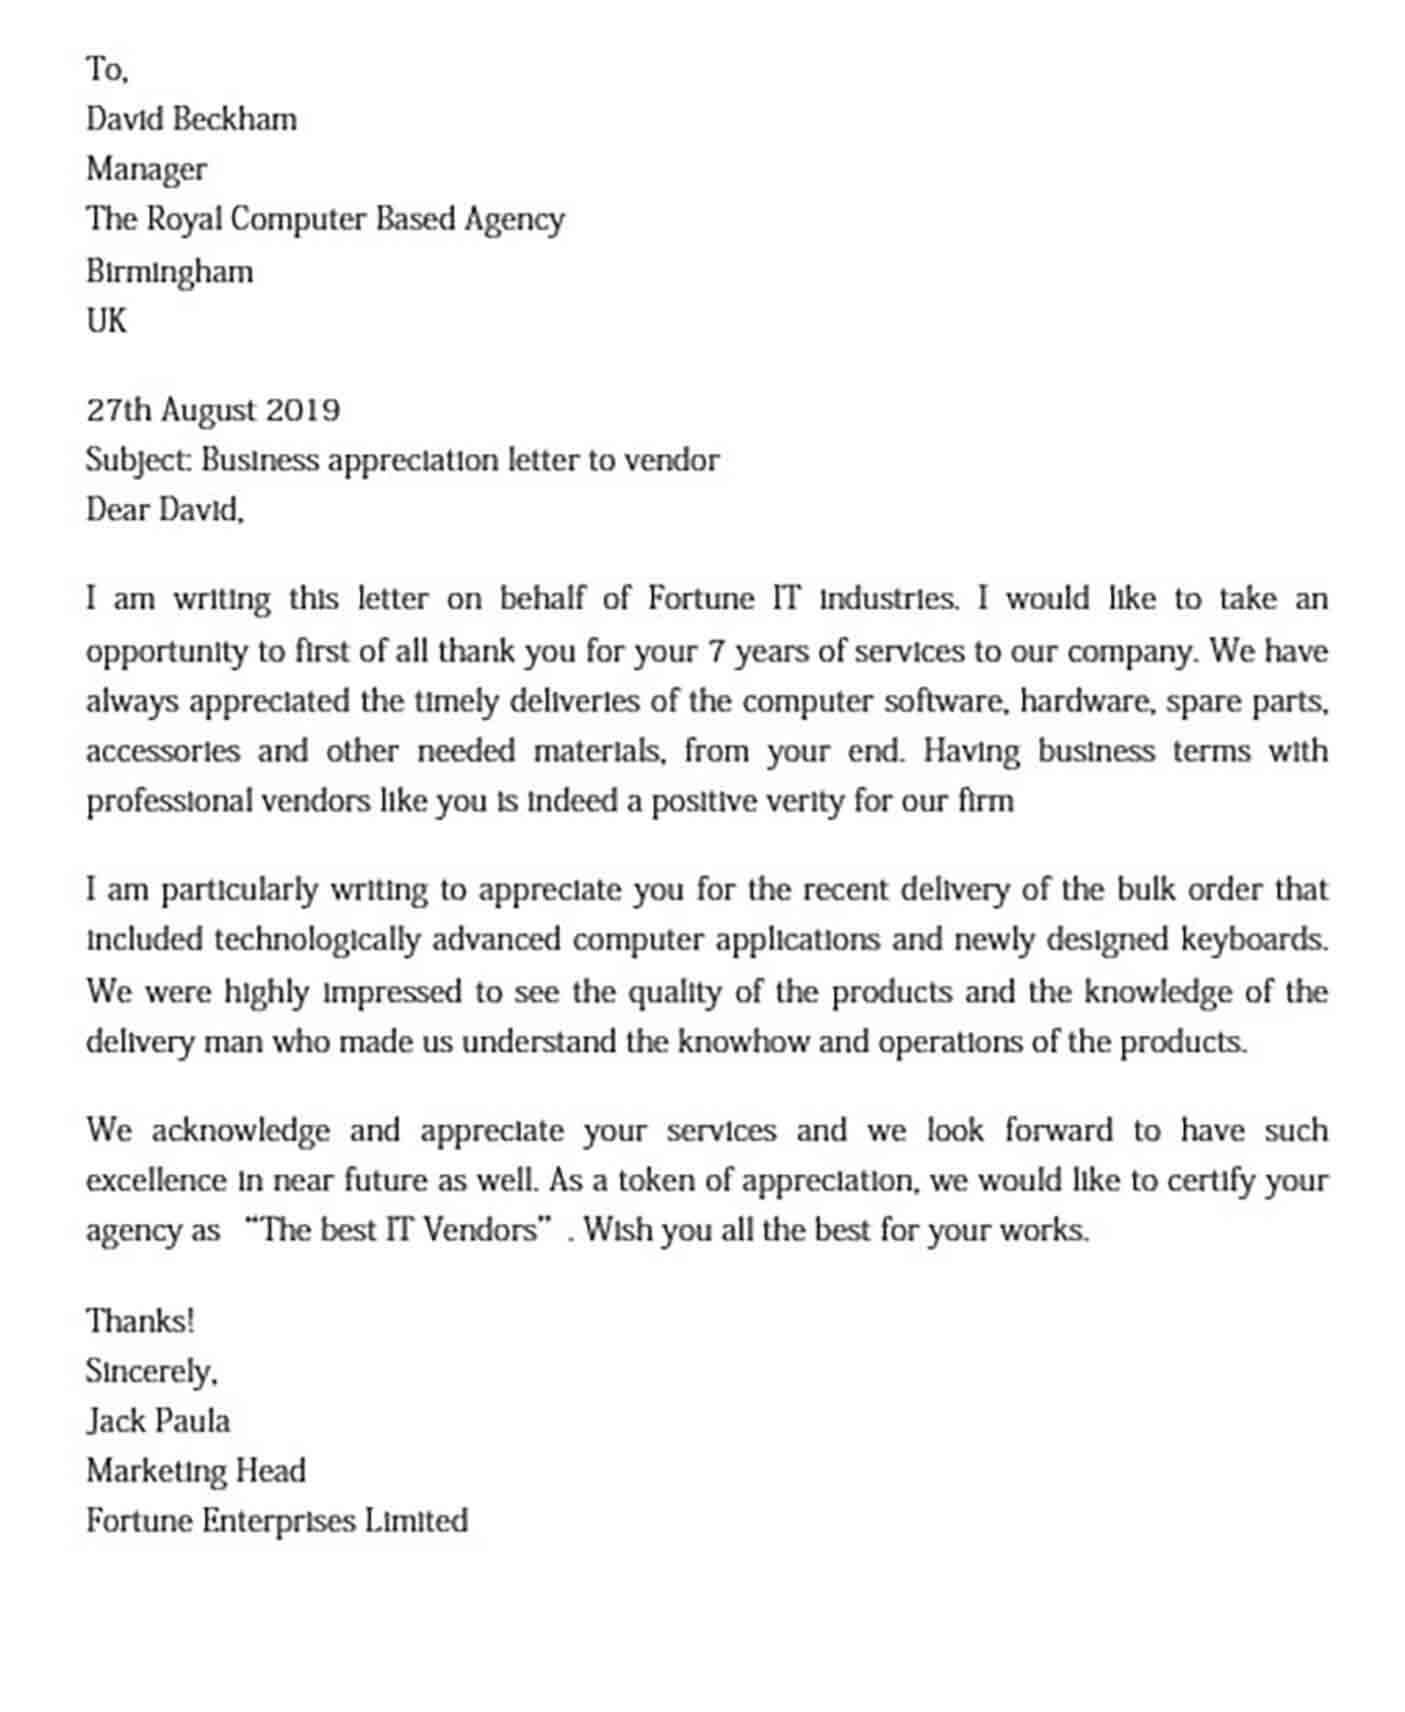 Business Appreciation Letter to Vendor DOC